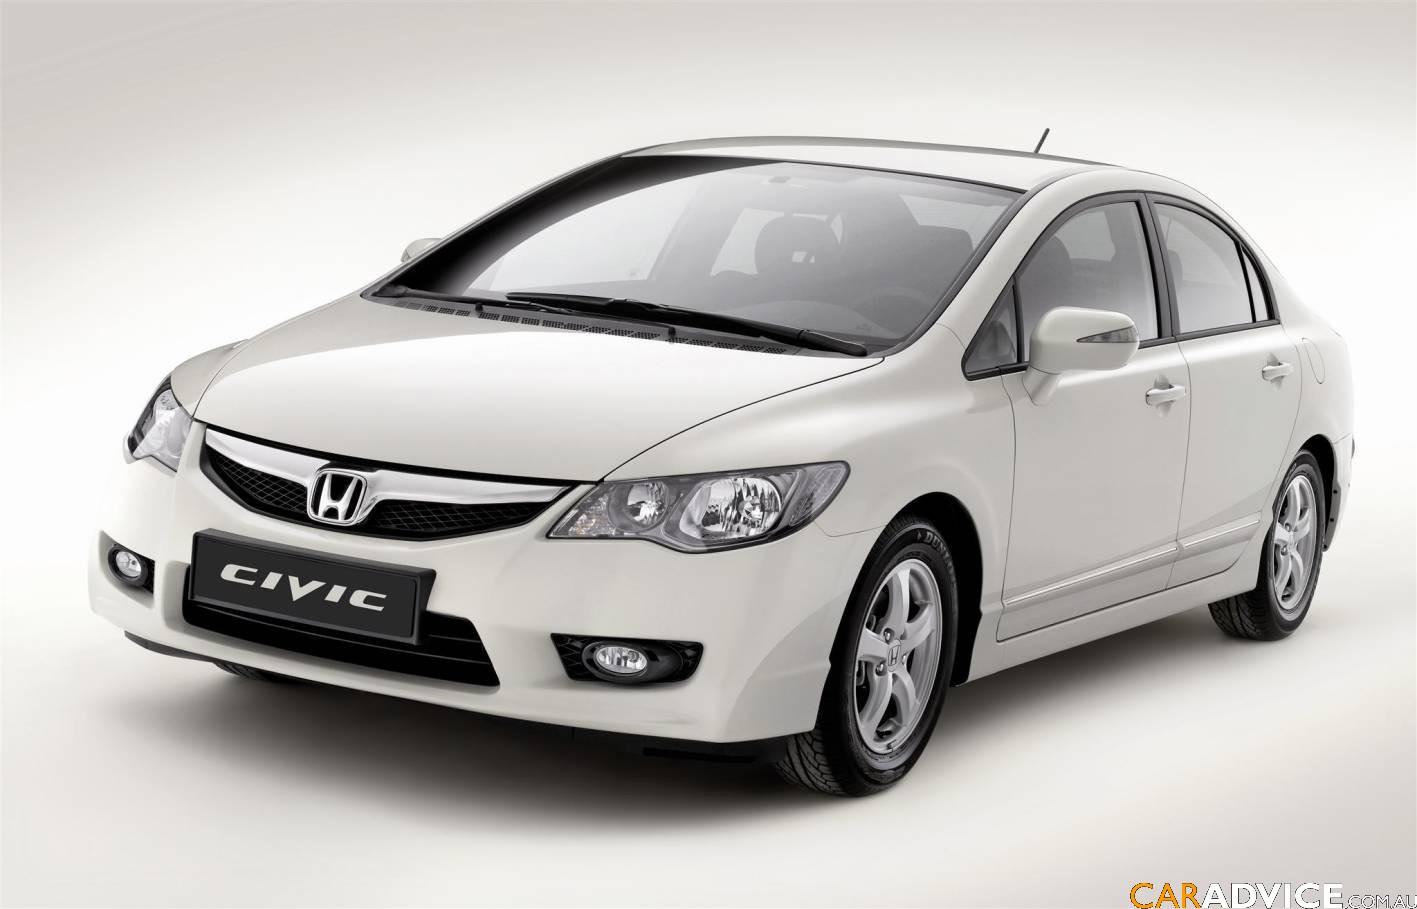 2009 Honda Civic Hybrid Car Advice Wallpaper For Ios